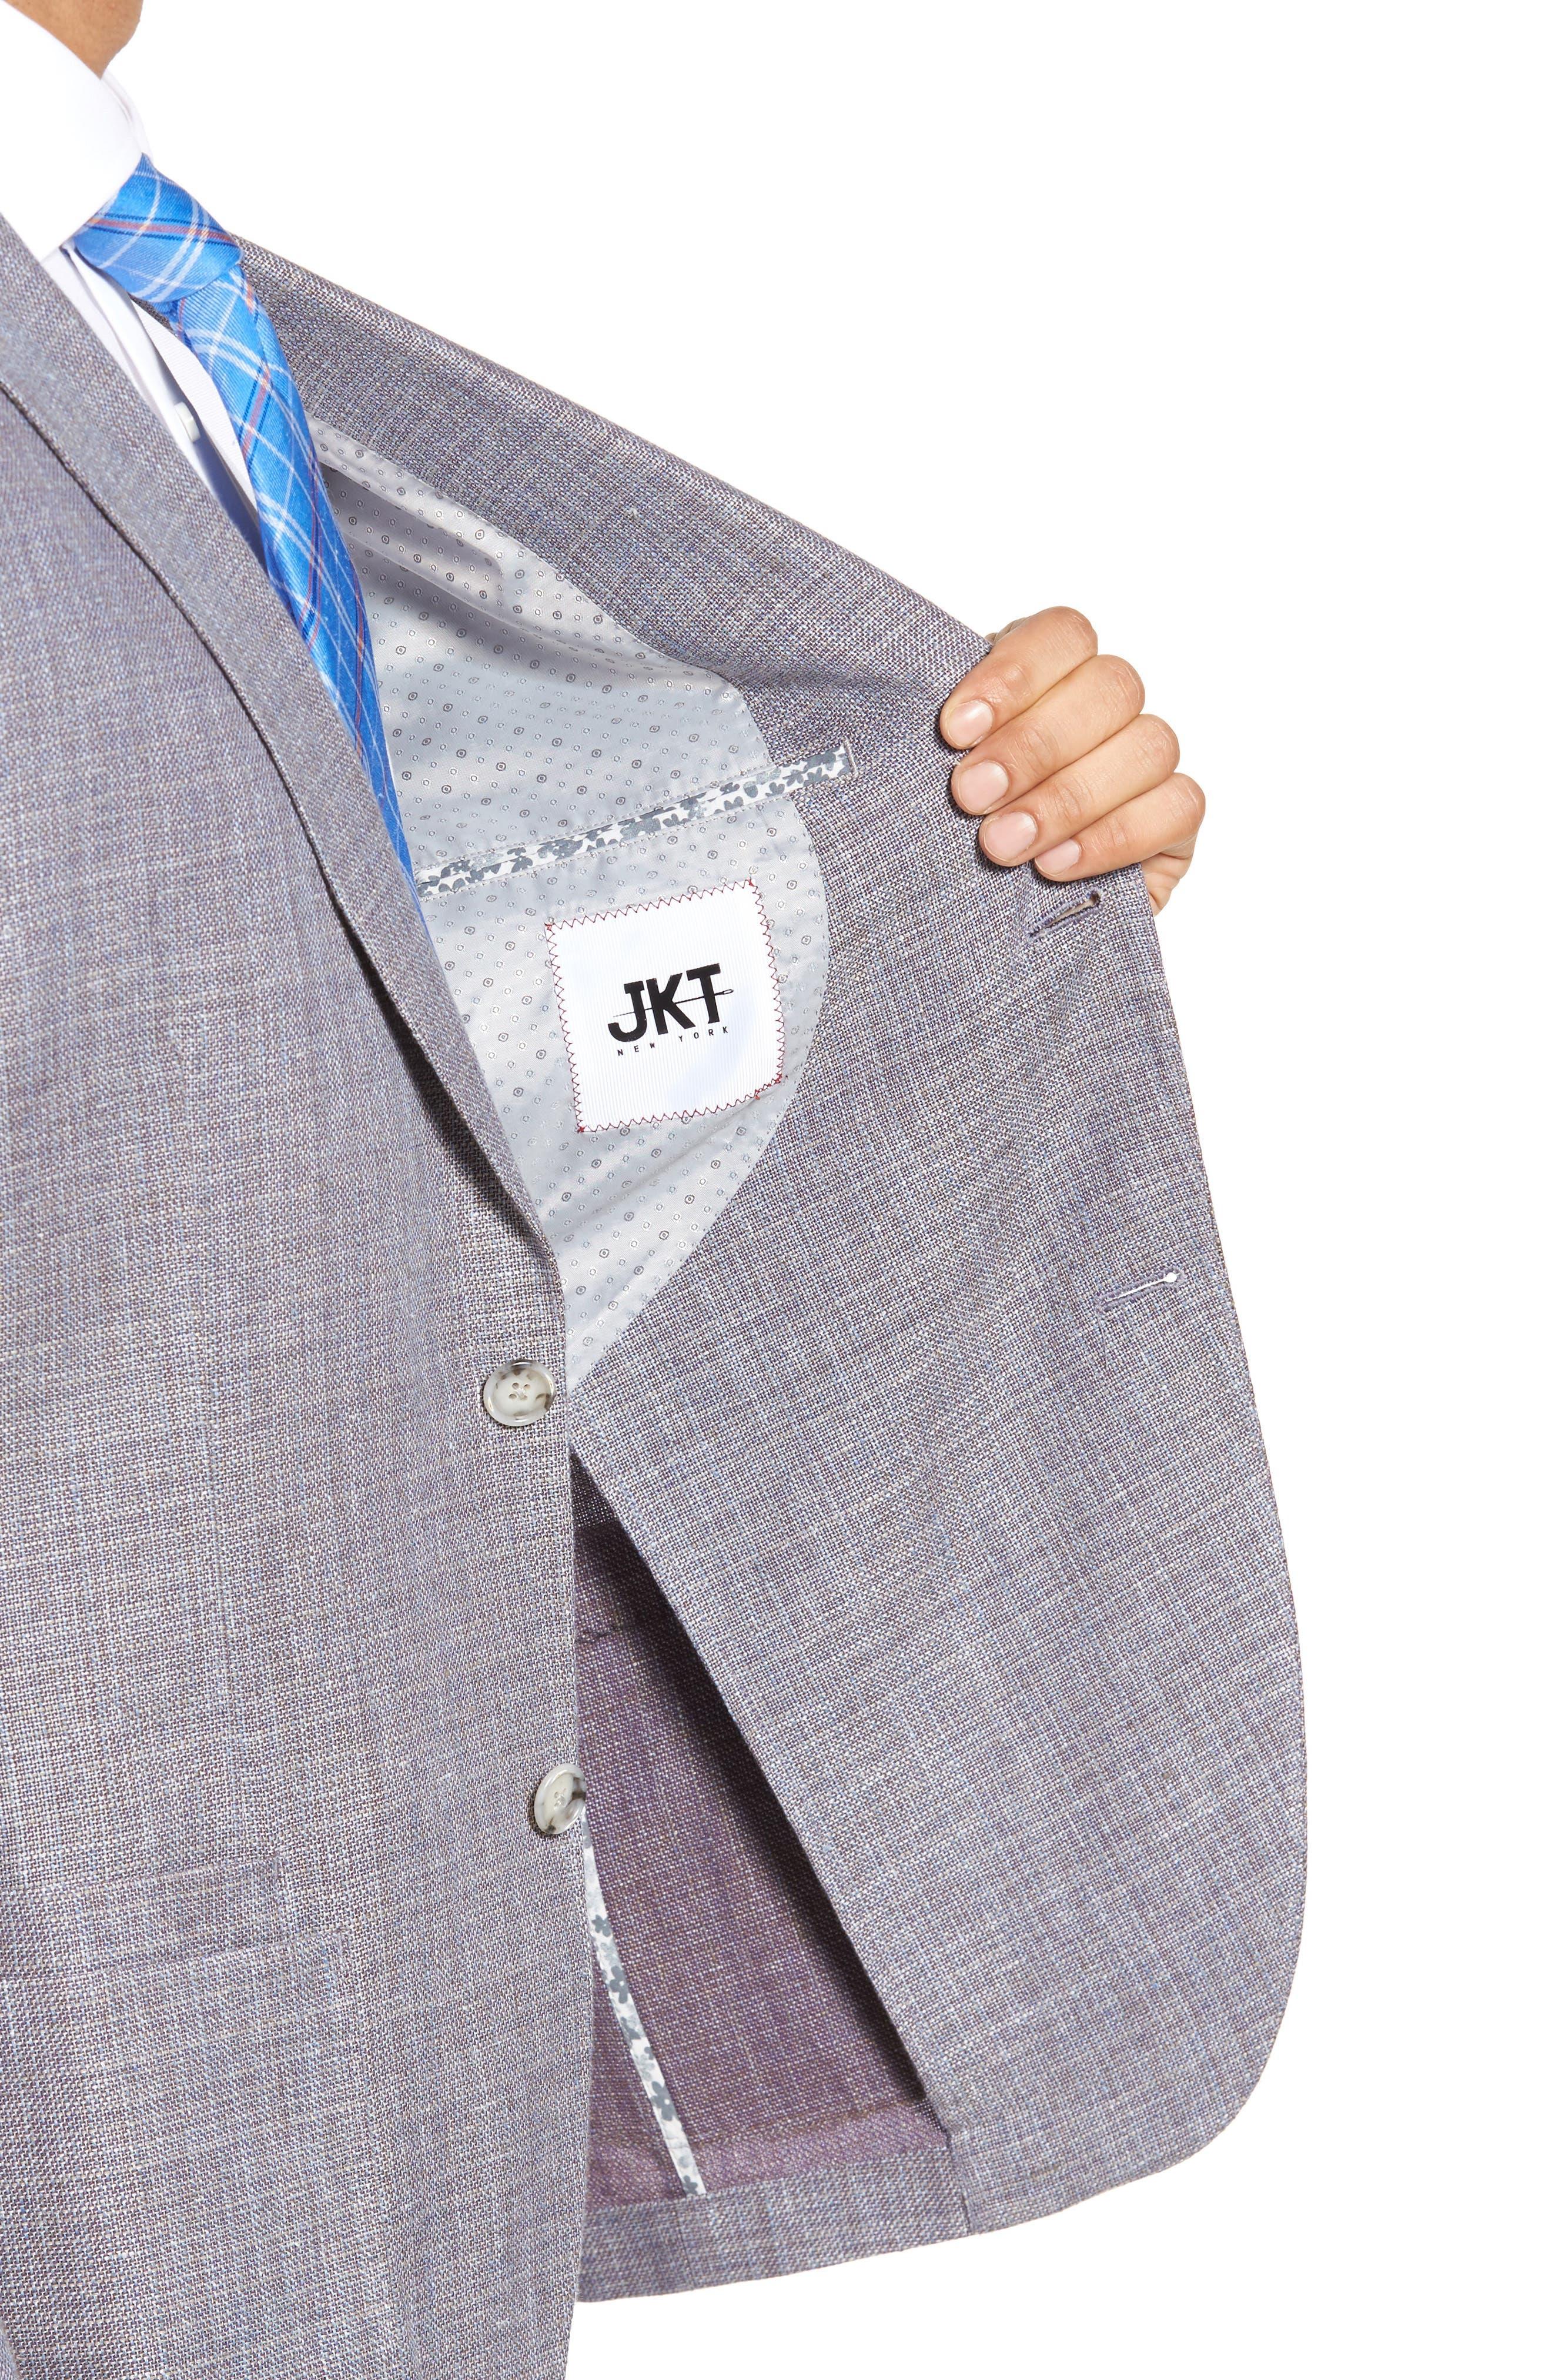 JKT NEW YORK,                             Trim Fit Wool & Linen Blazer,                             Alternate thumbnail 4, color,                             020